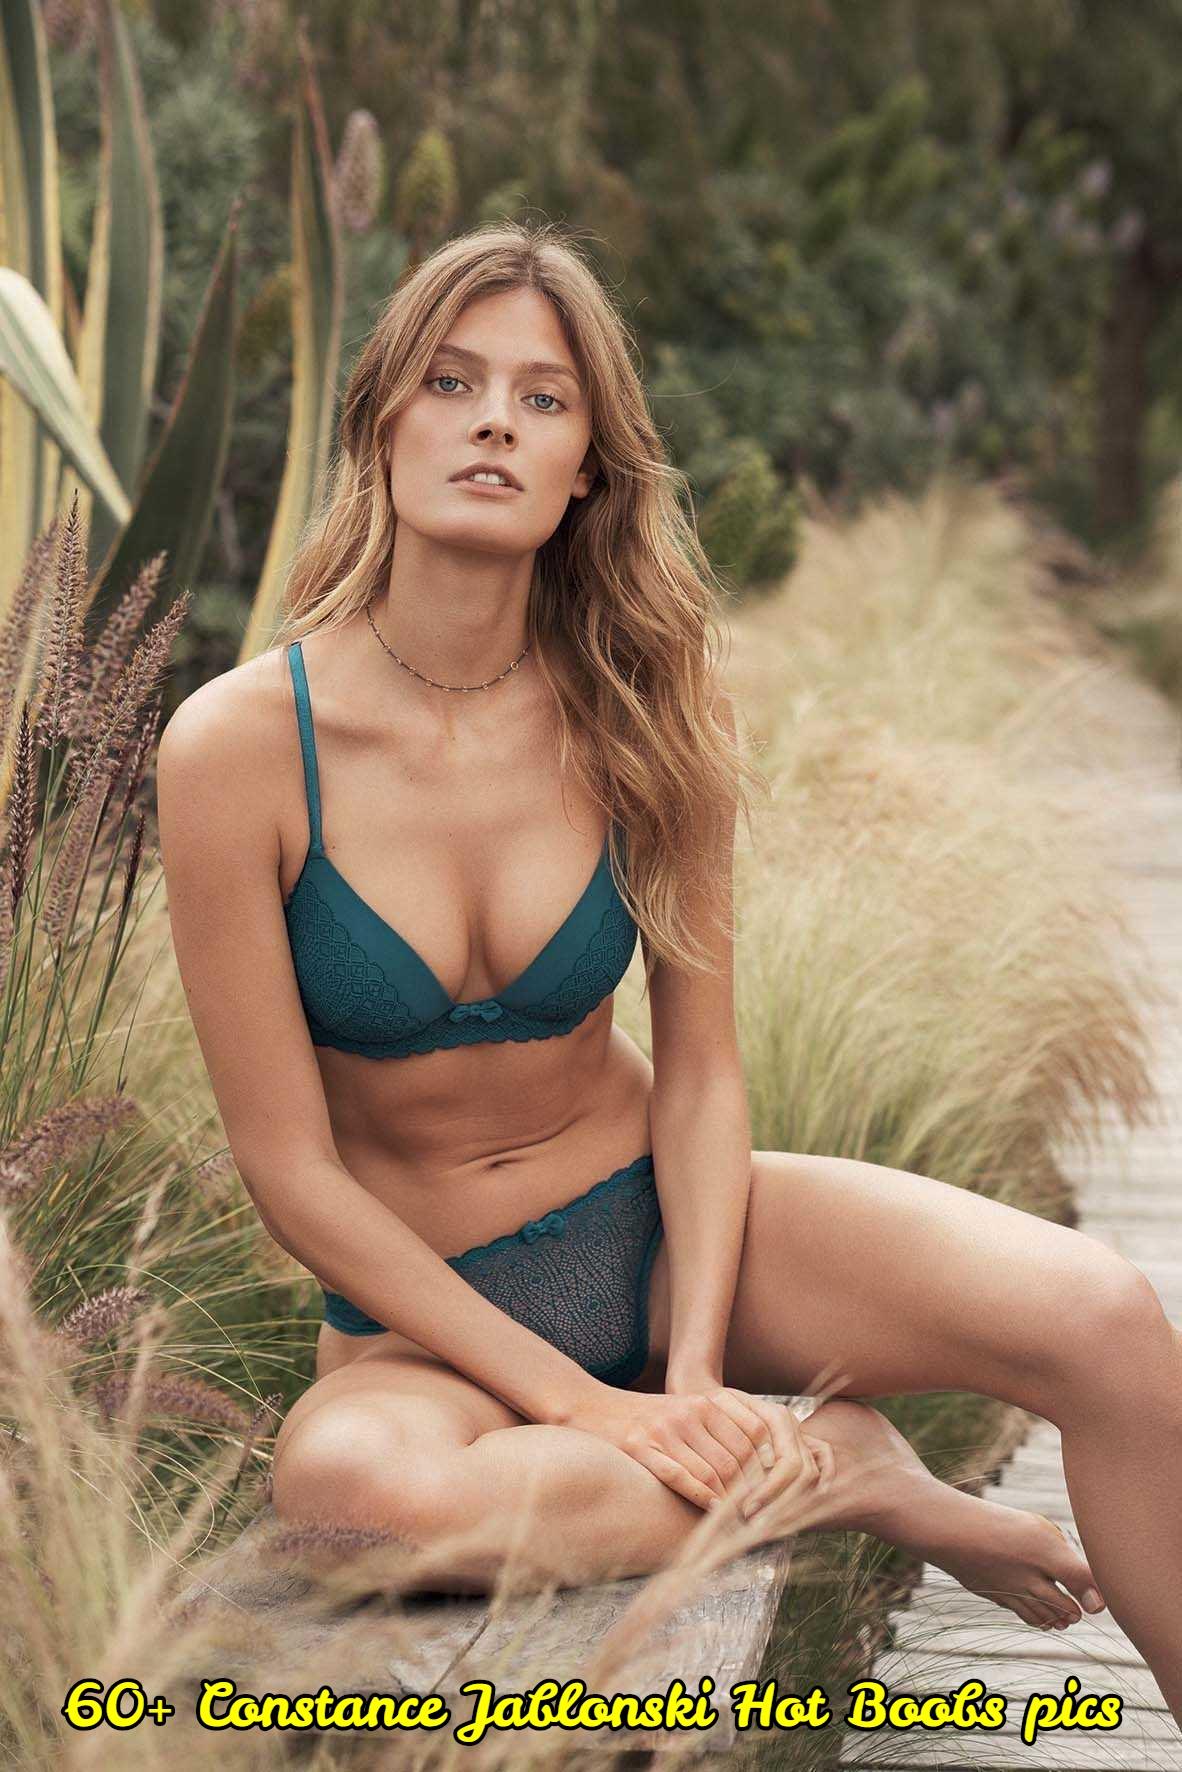 Constance Jablonski hot cleavage pic